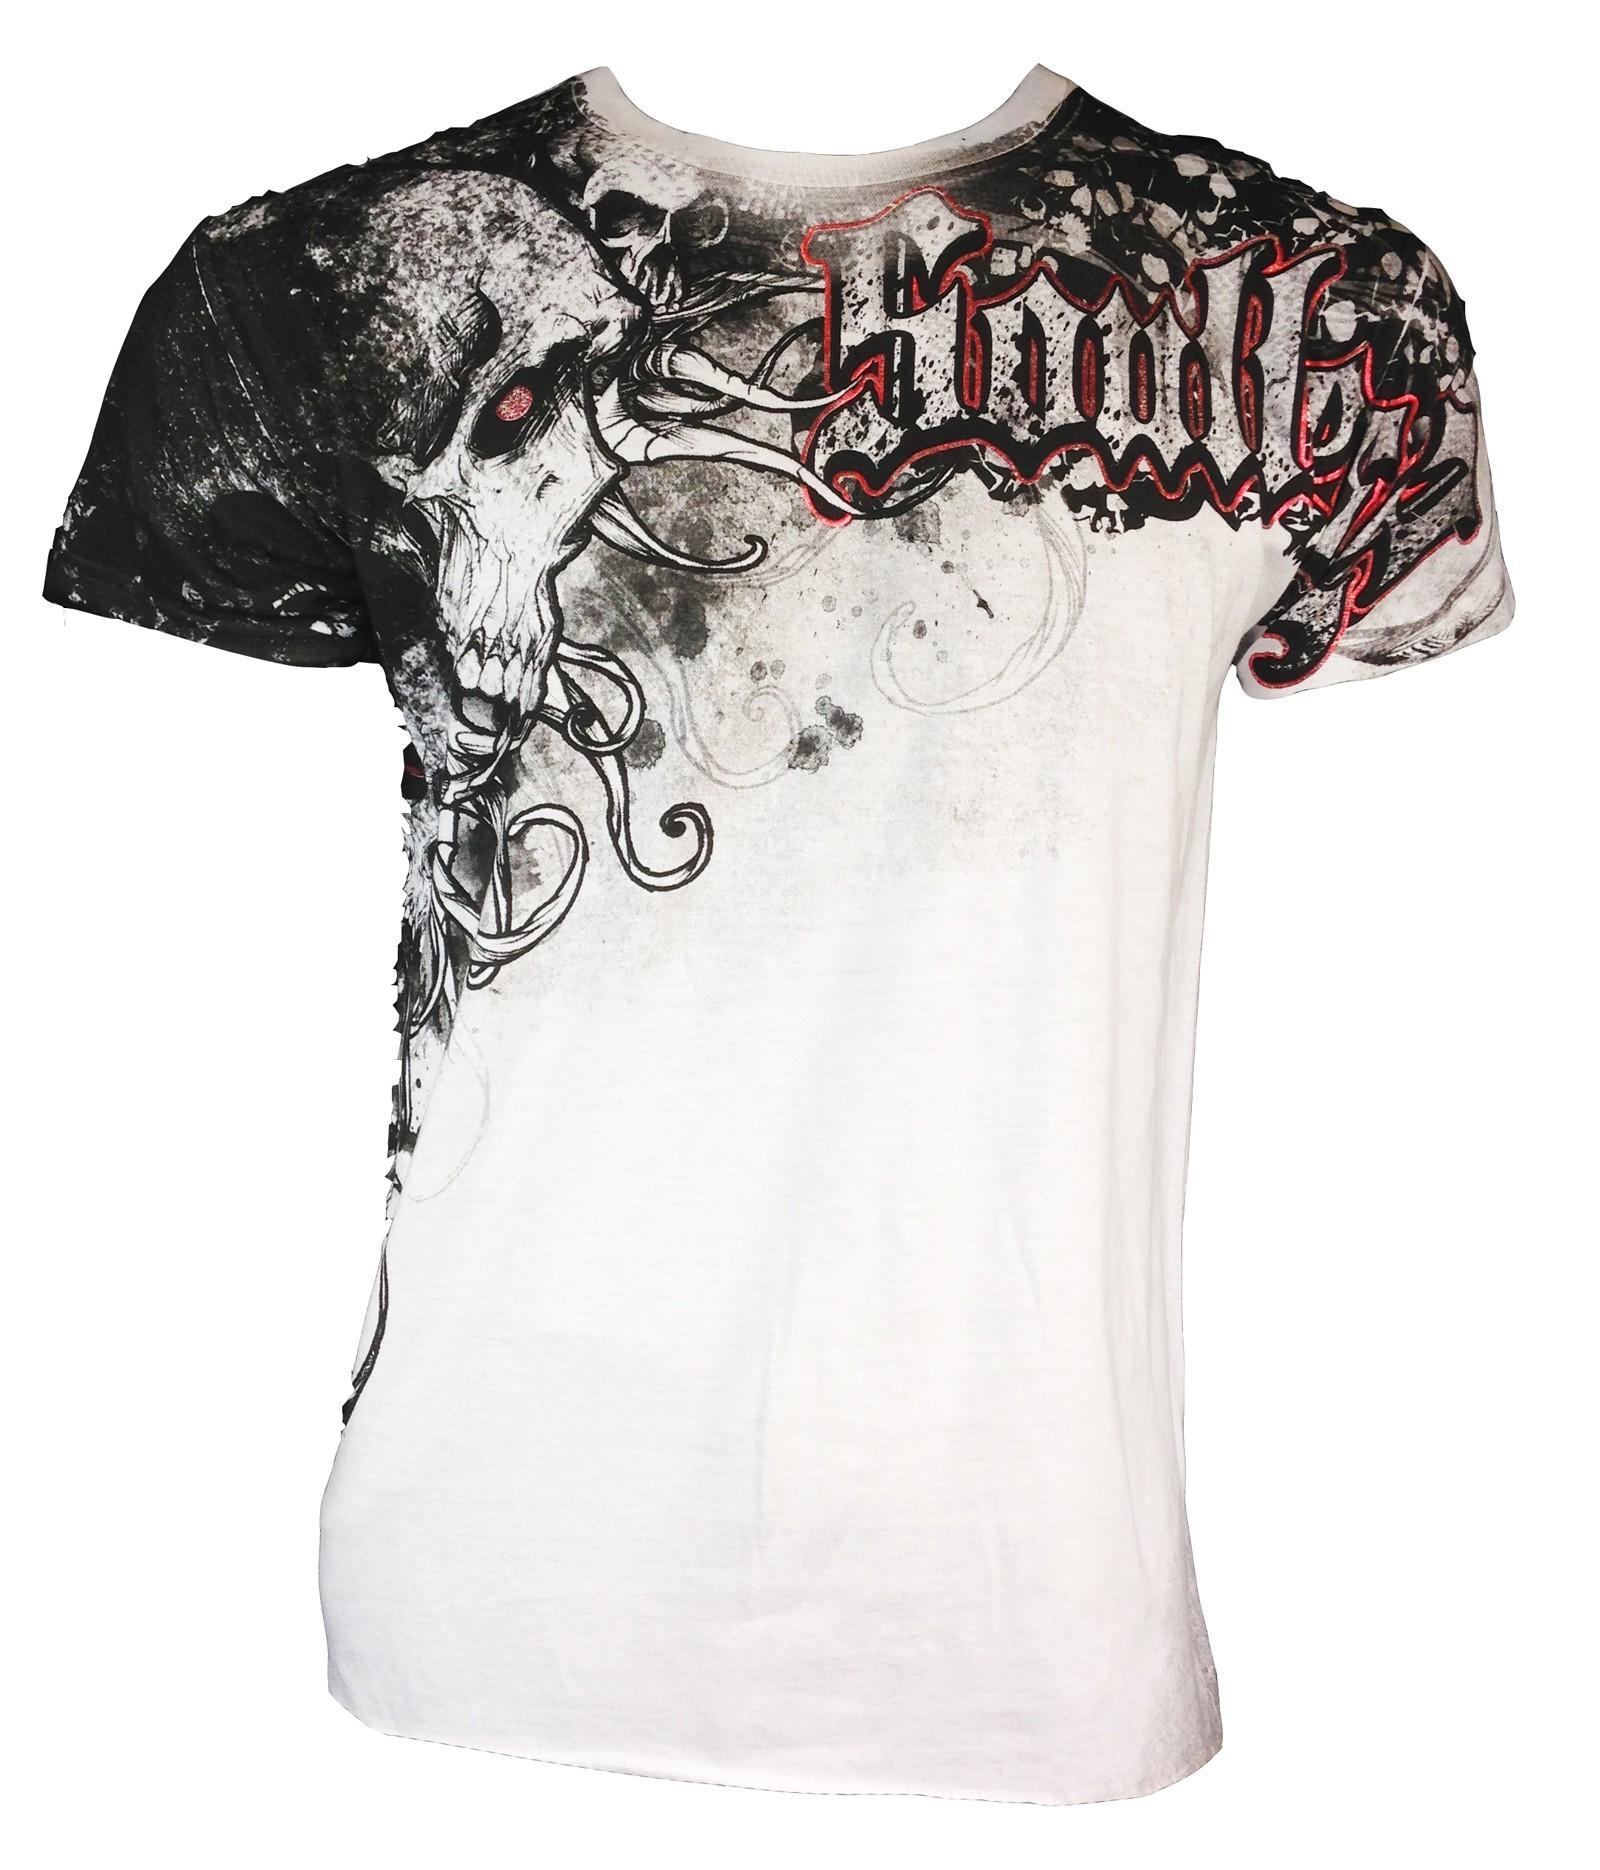 Xzavier - Soul Skulls T-Shirt Front